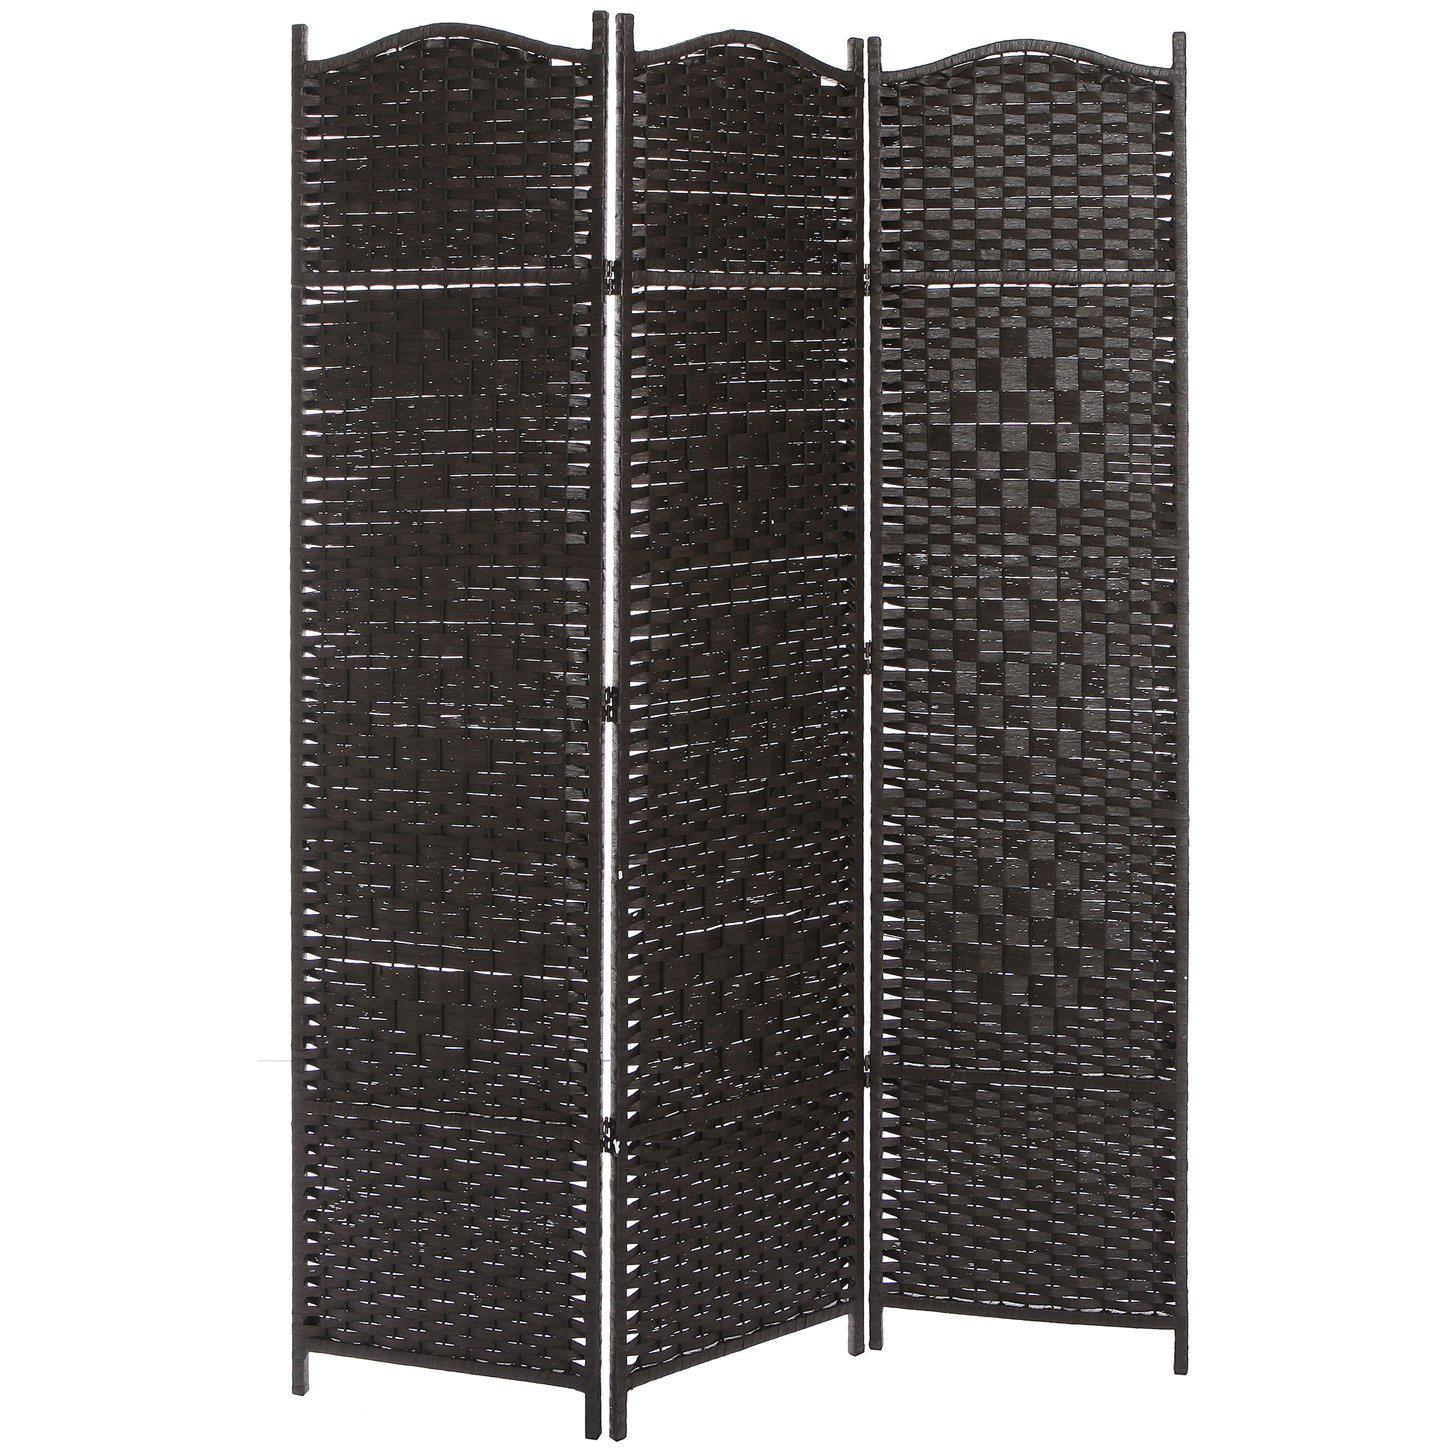 MyGift 3 Panel Dark Brown Wood & Bamboo Woven Room Divider, Decorative Indoor Folding Screens